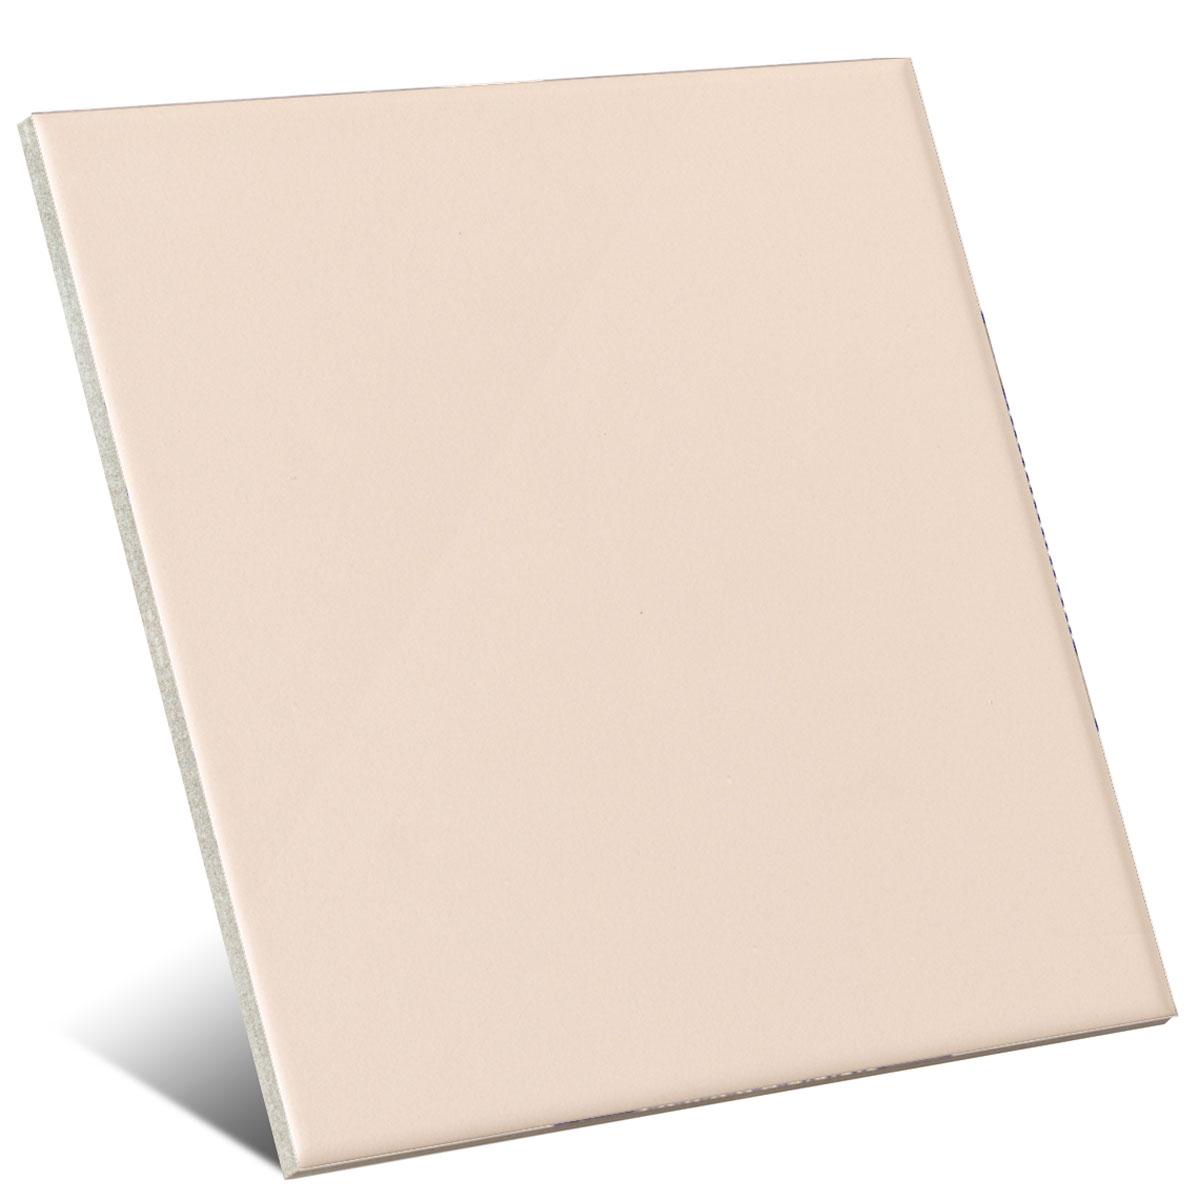 Color nacar mate 20x20 cm (caja 1 m2)